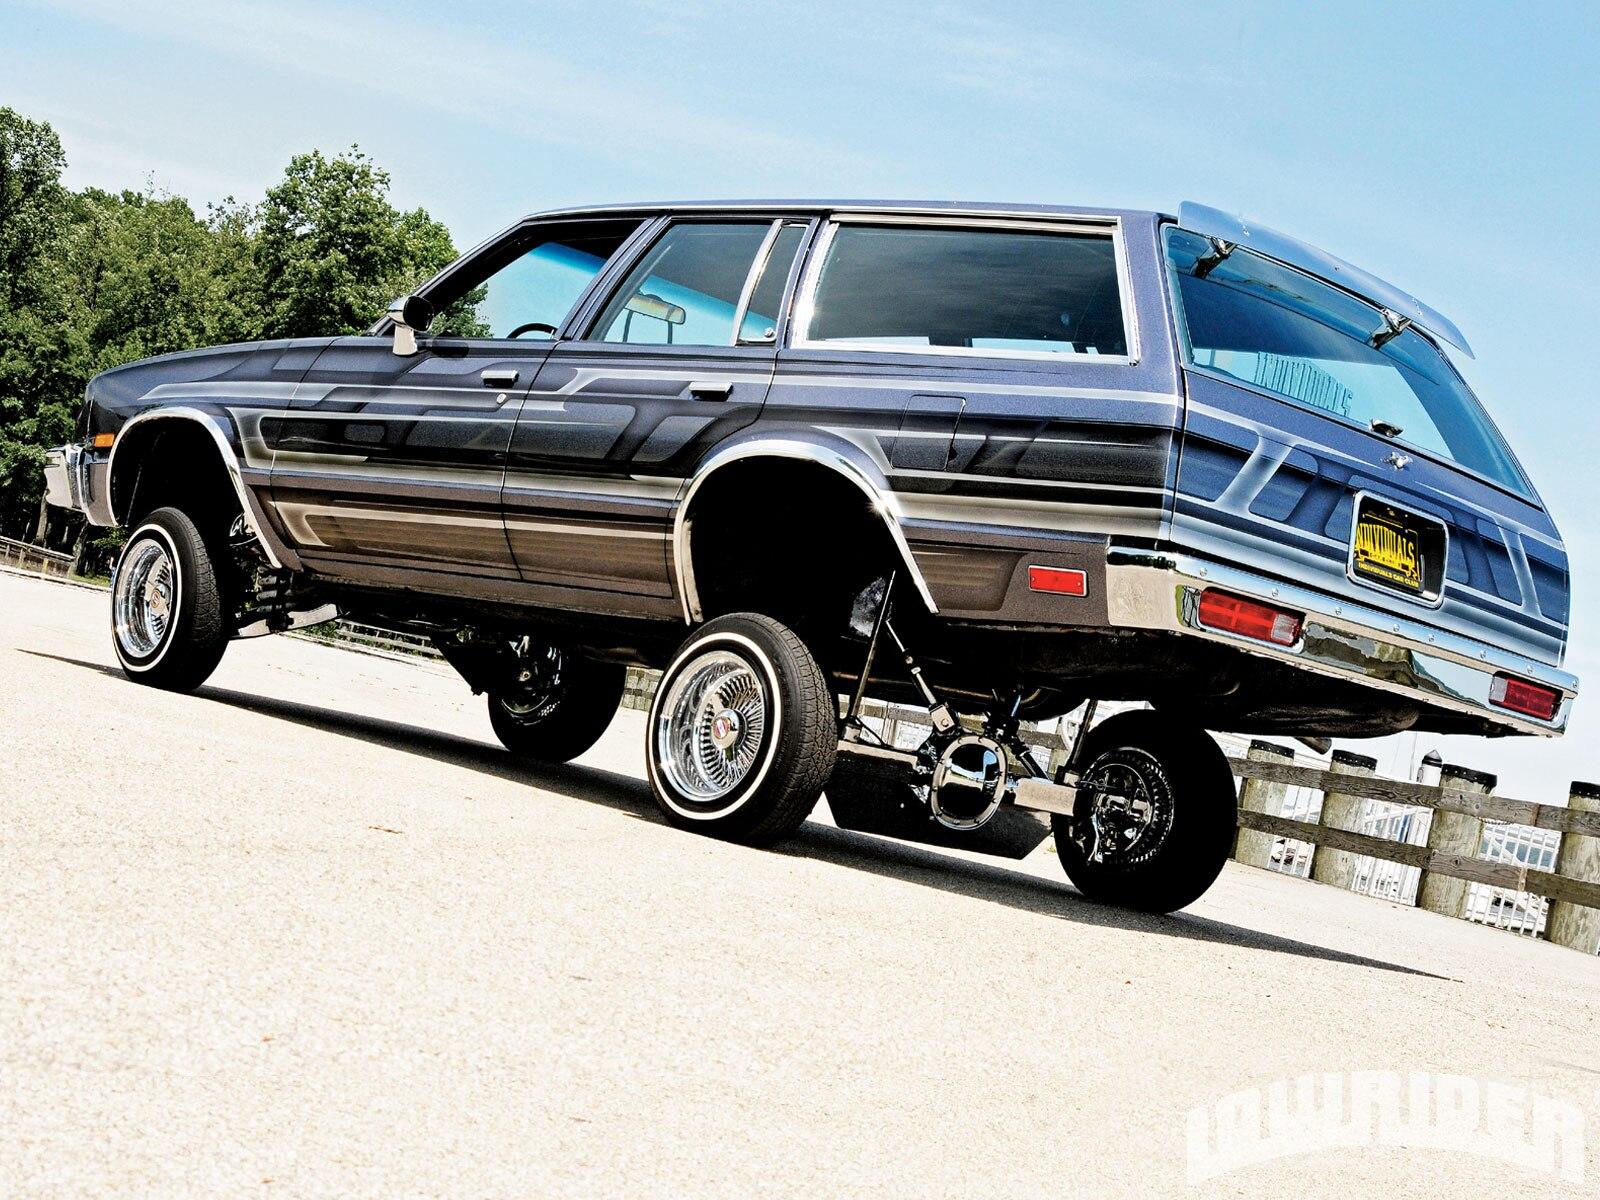 1982 Chevrolet Malibu Classic Station Wagon - Lowrider Magazine